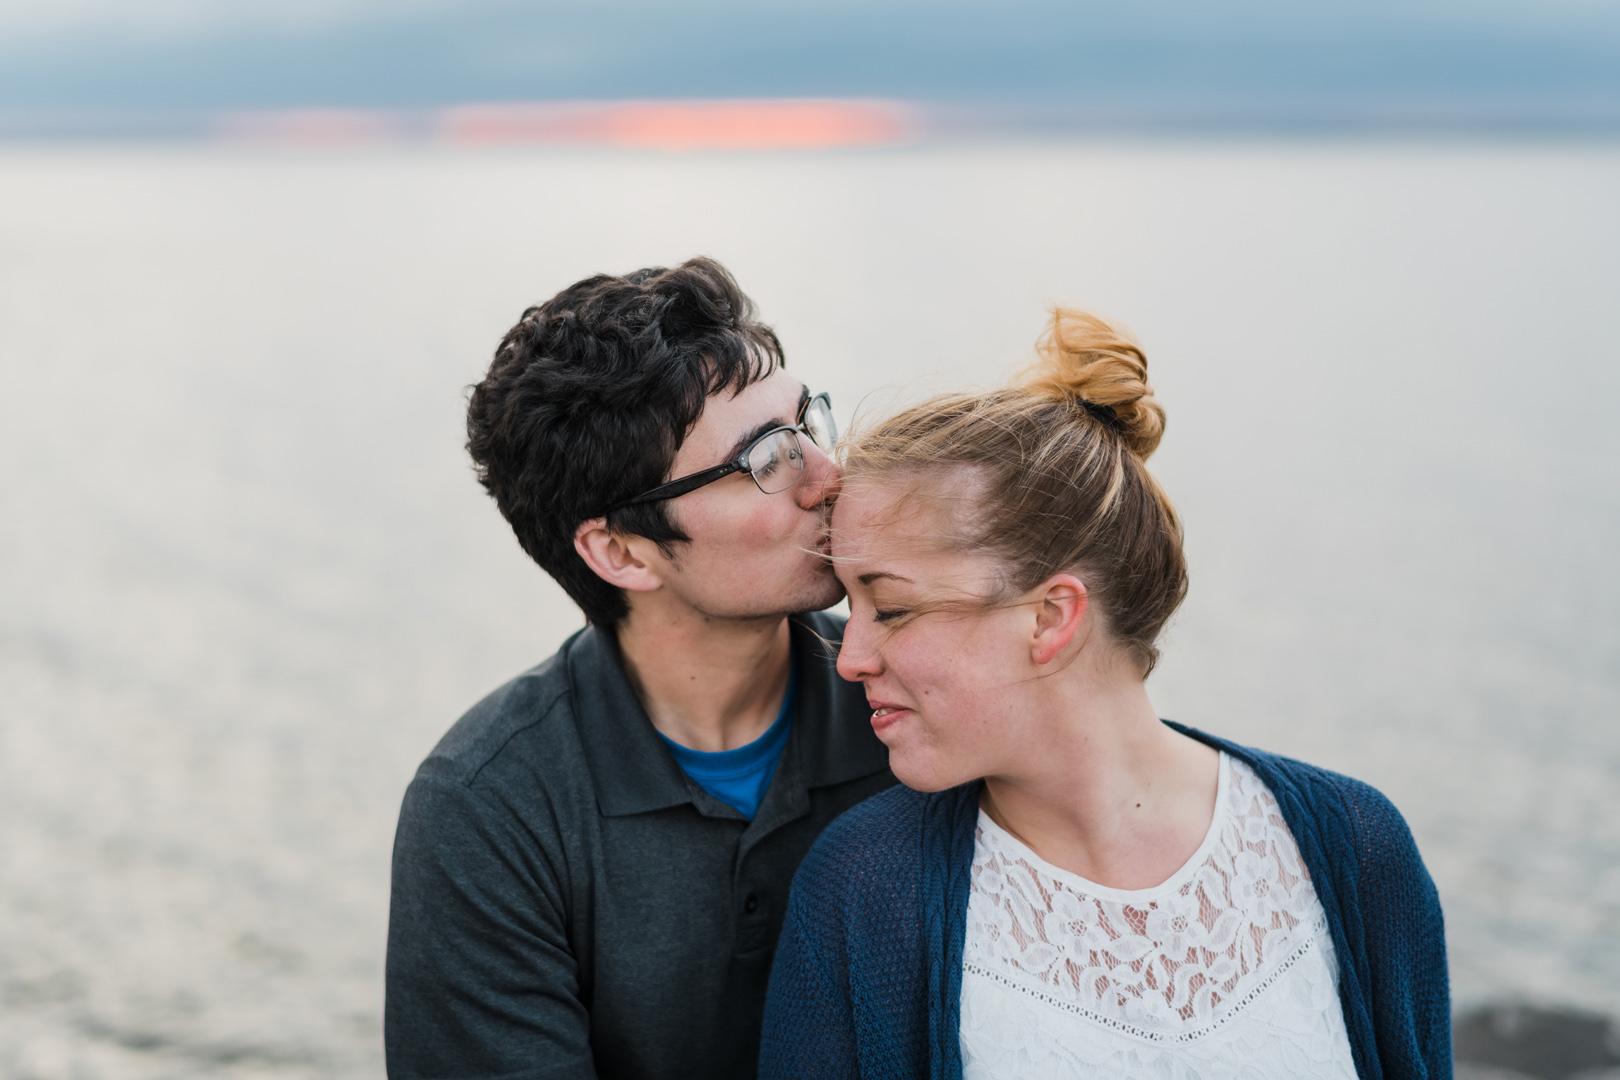 Man kisses fiance during sunset